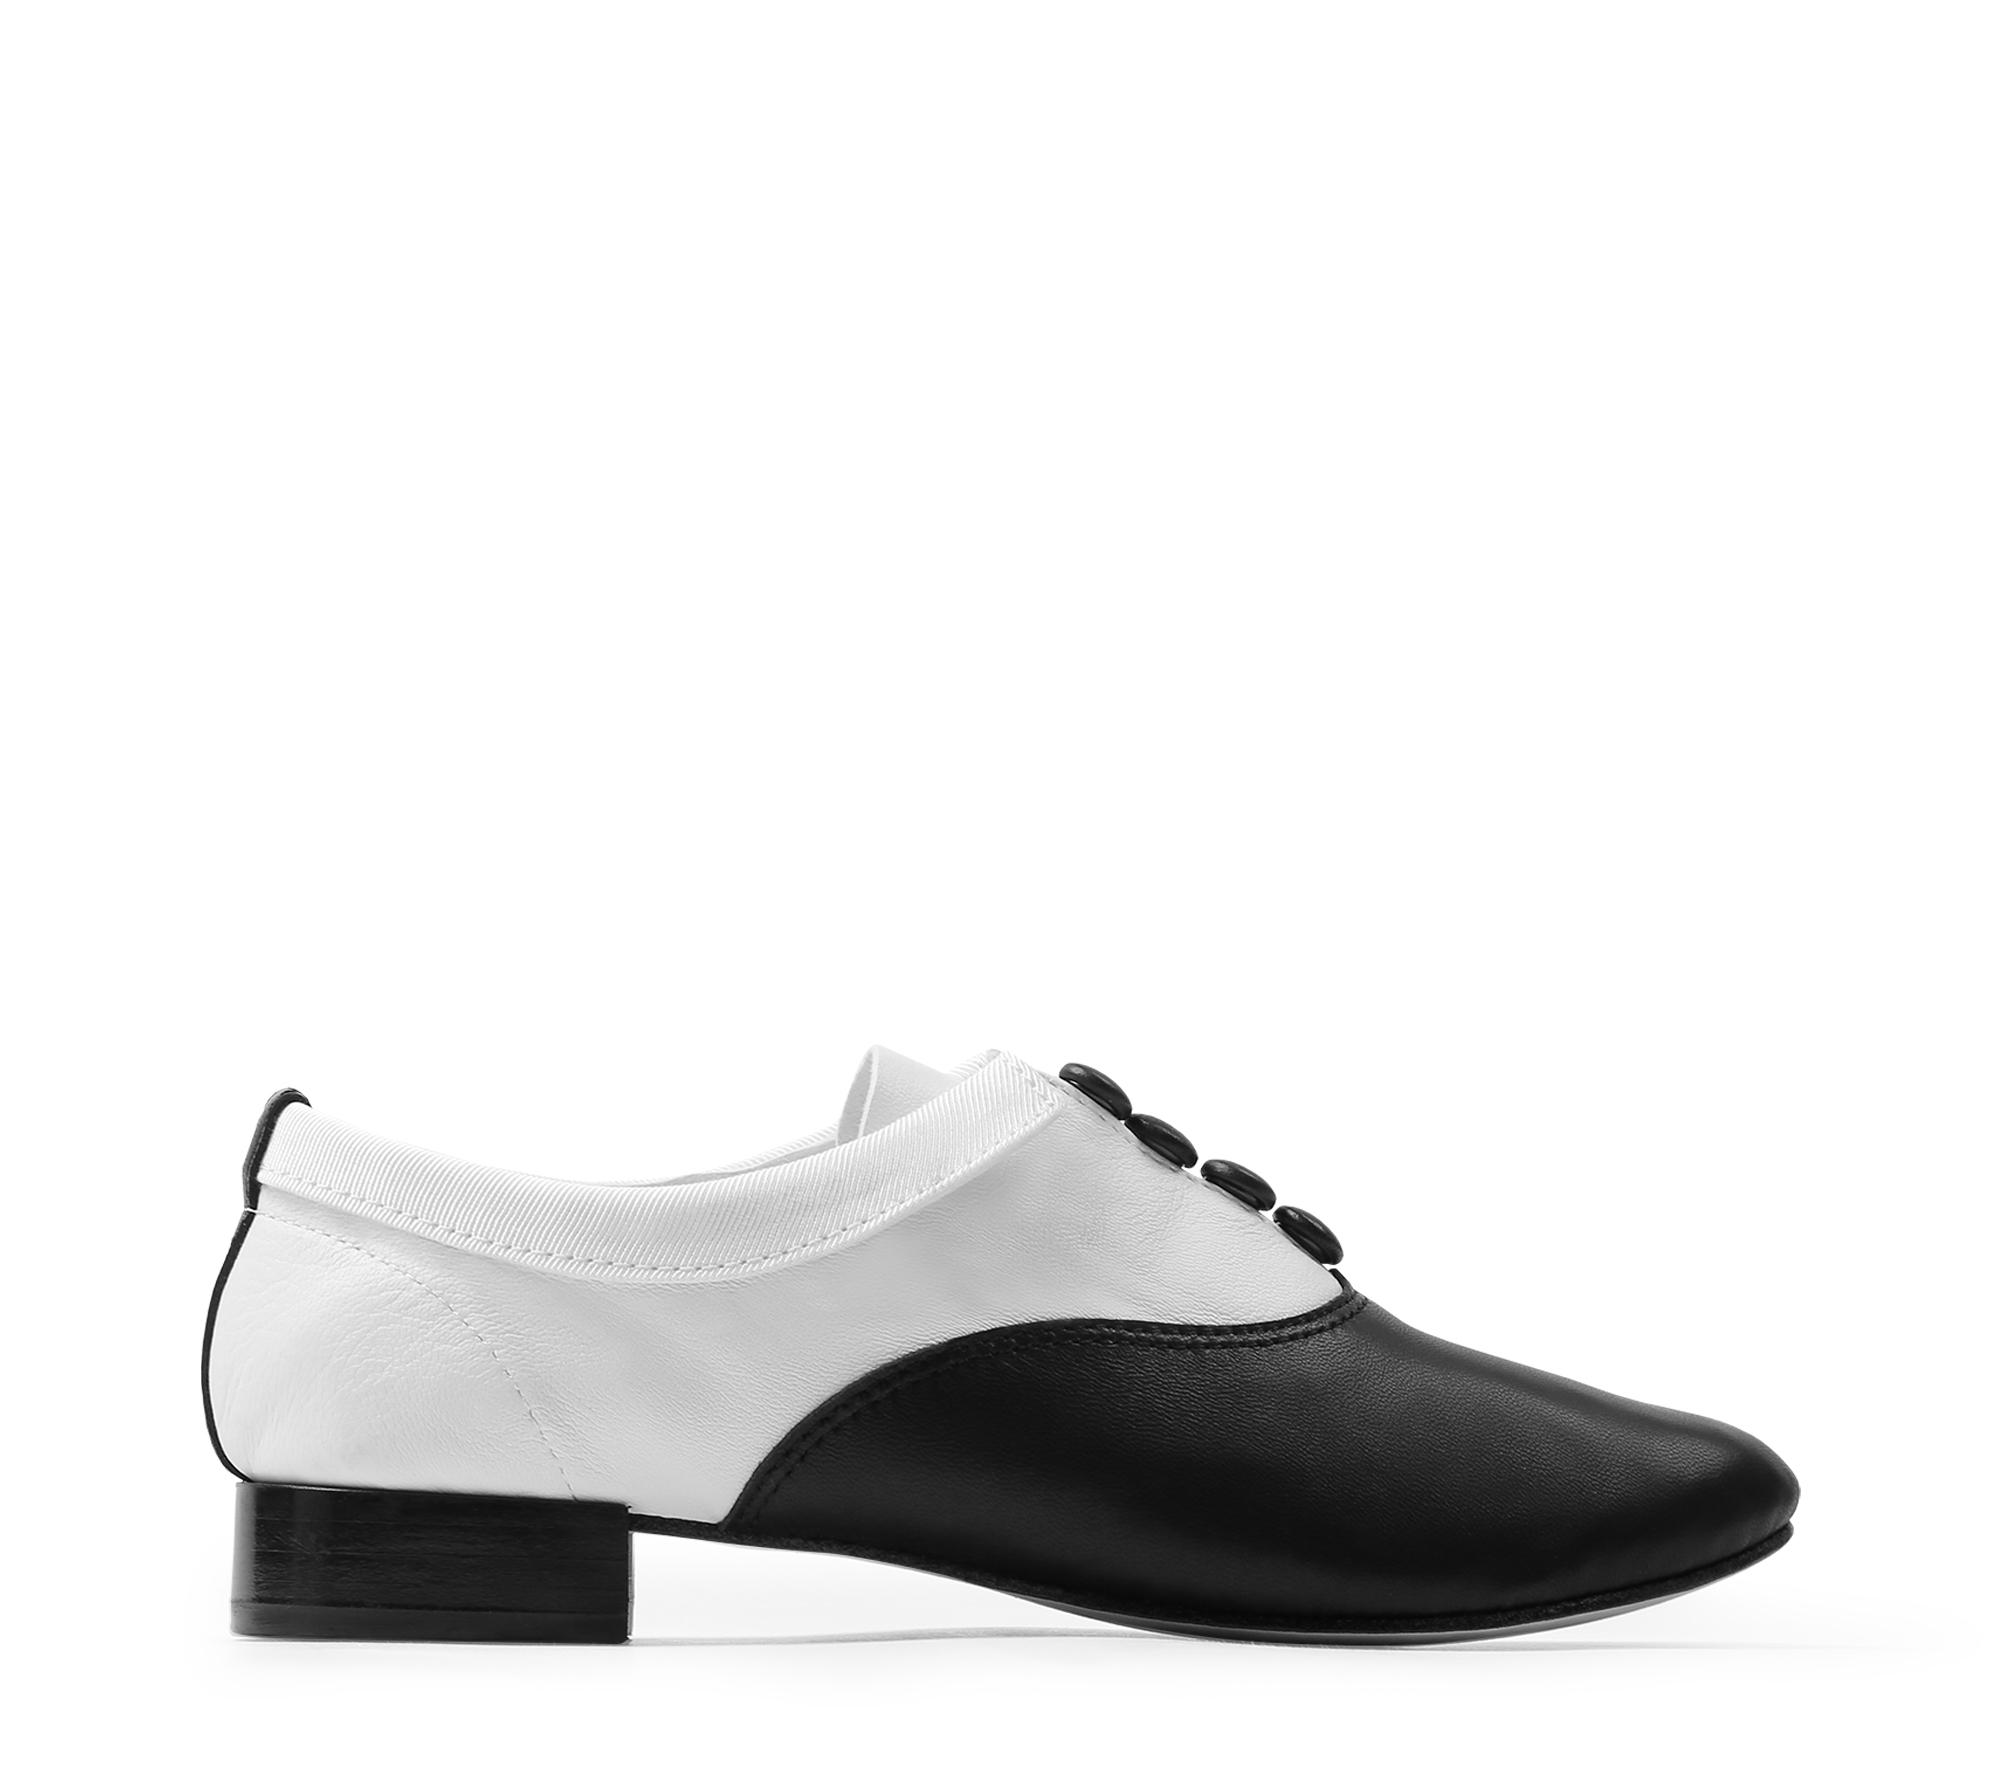 Zizi Oxford-Schuhe von SIA